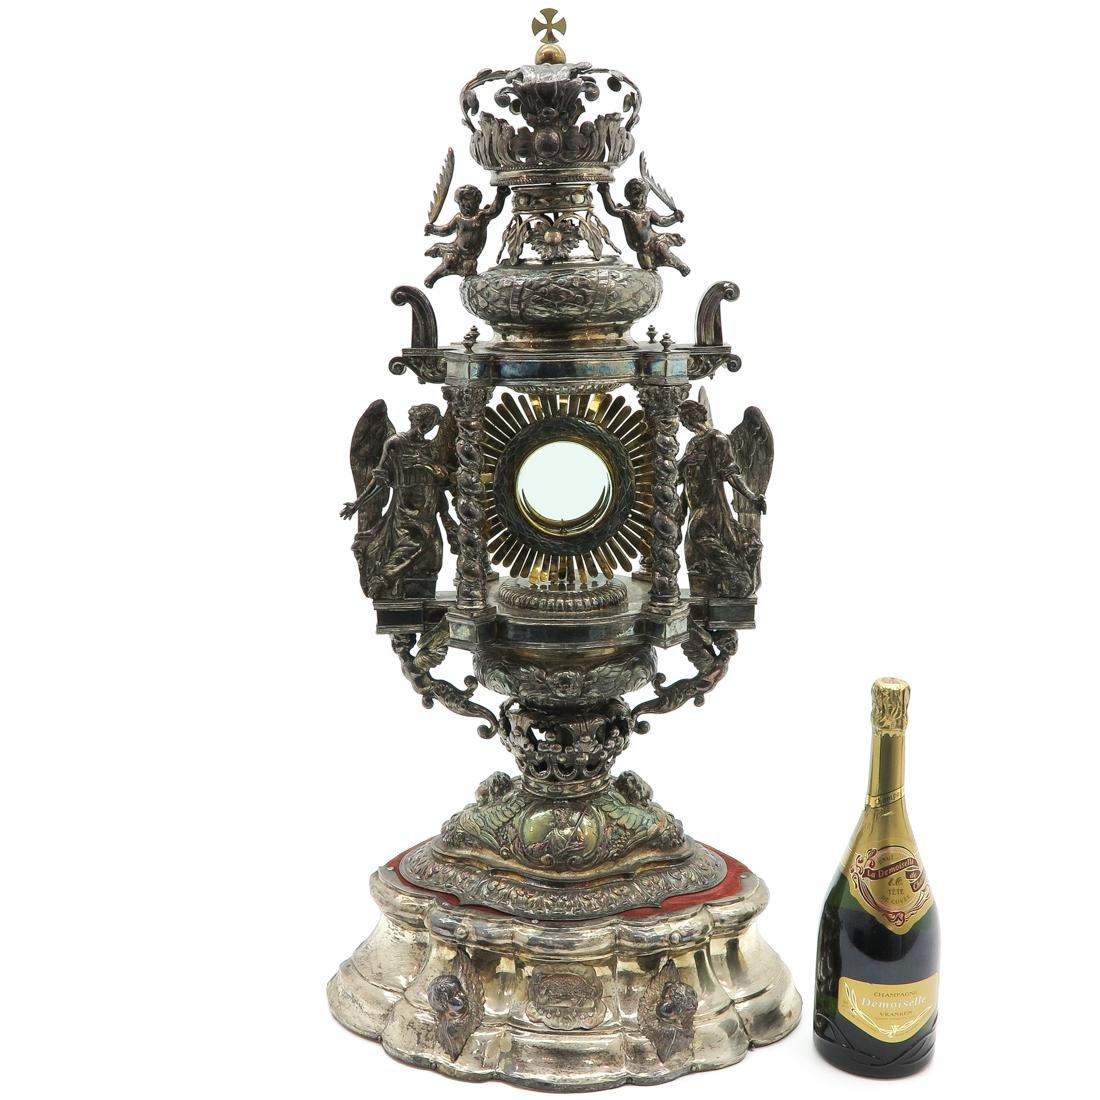 A Fine 18th / 19th Century Silver Monstrance - 6